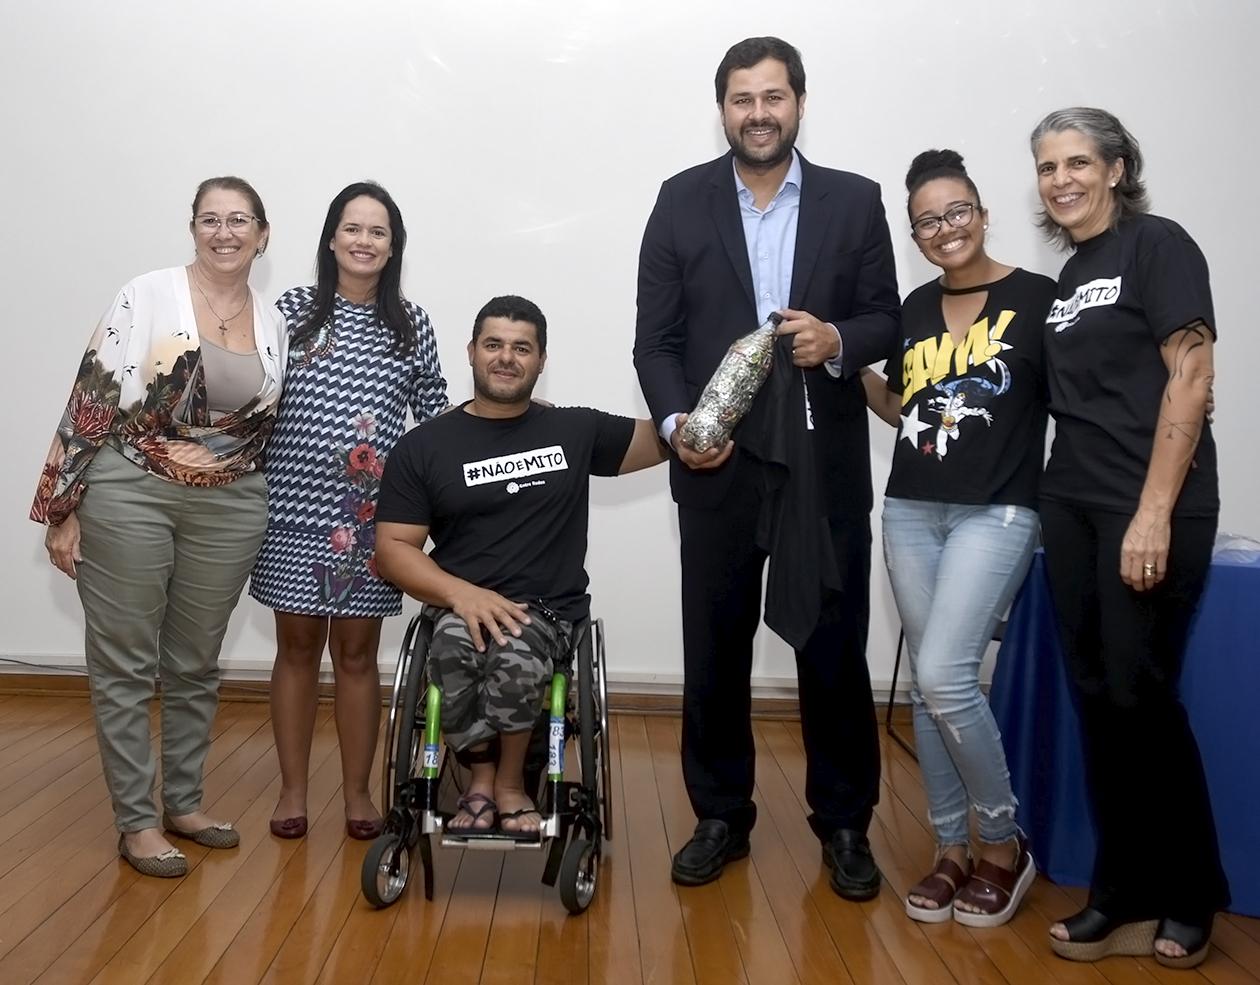 cadeirante recebe garrafa com lacres de latas de alumínio, utilizados para confeccionar cadeiras de roda